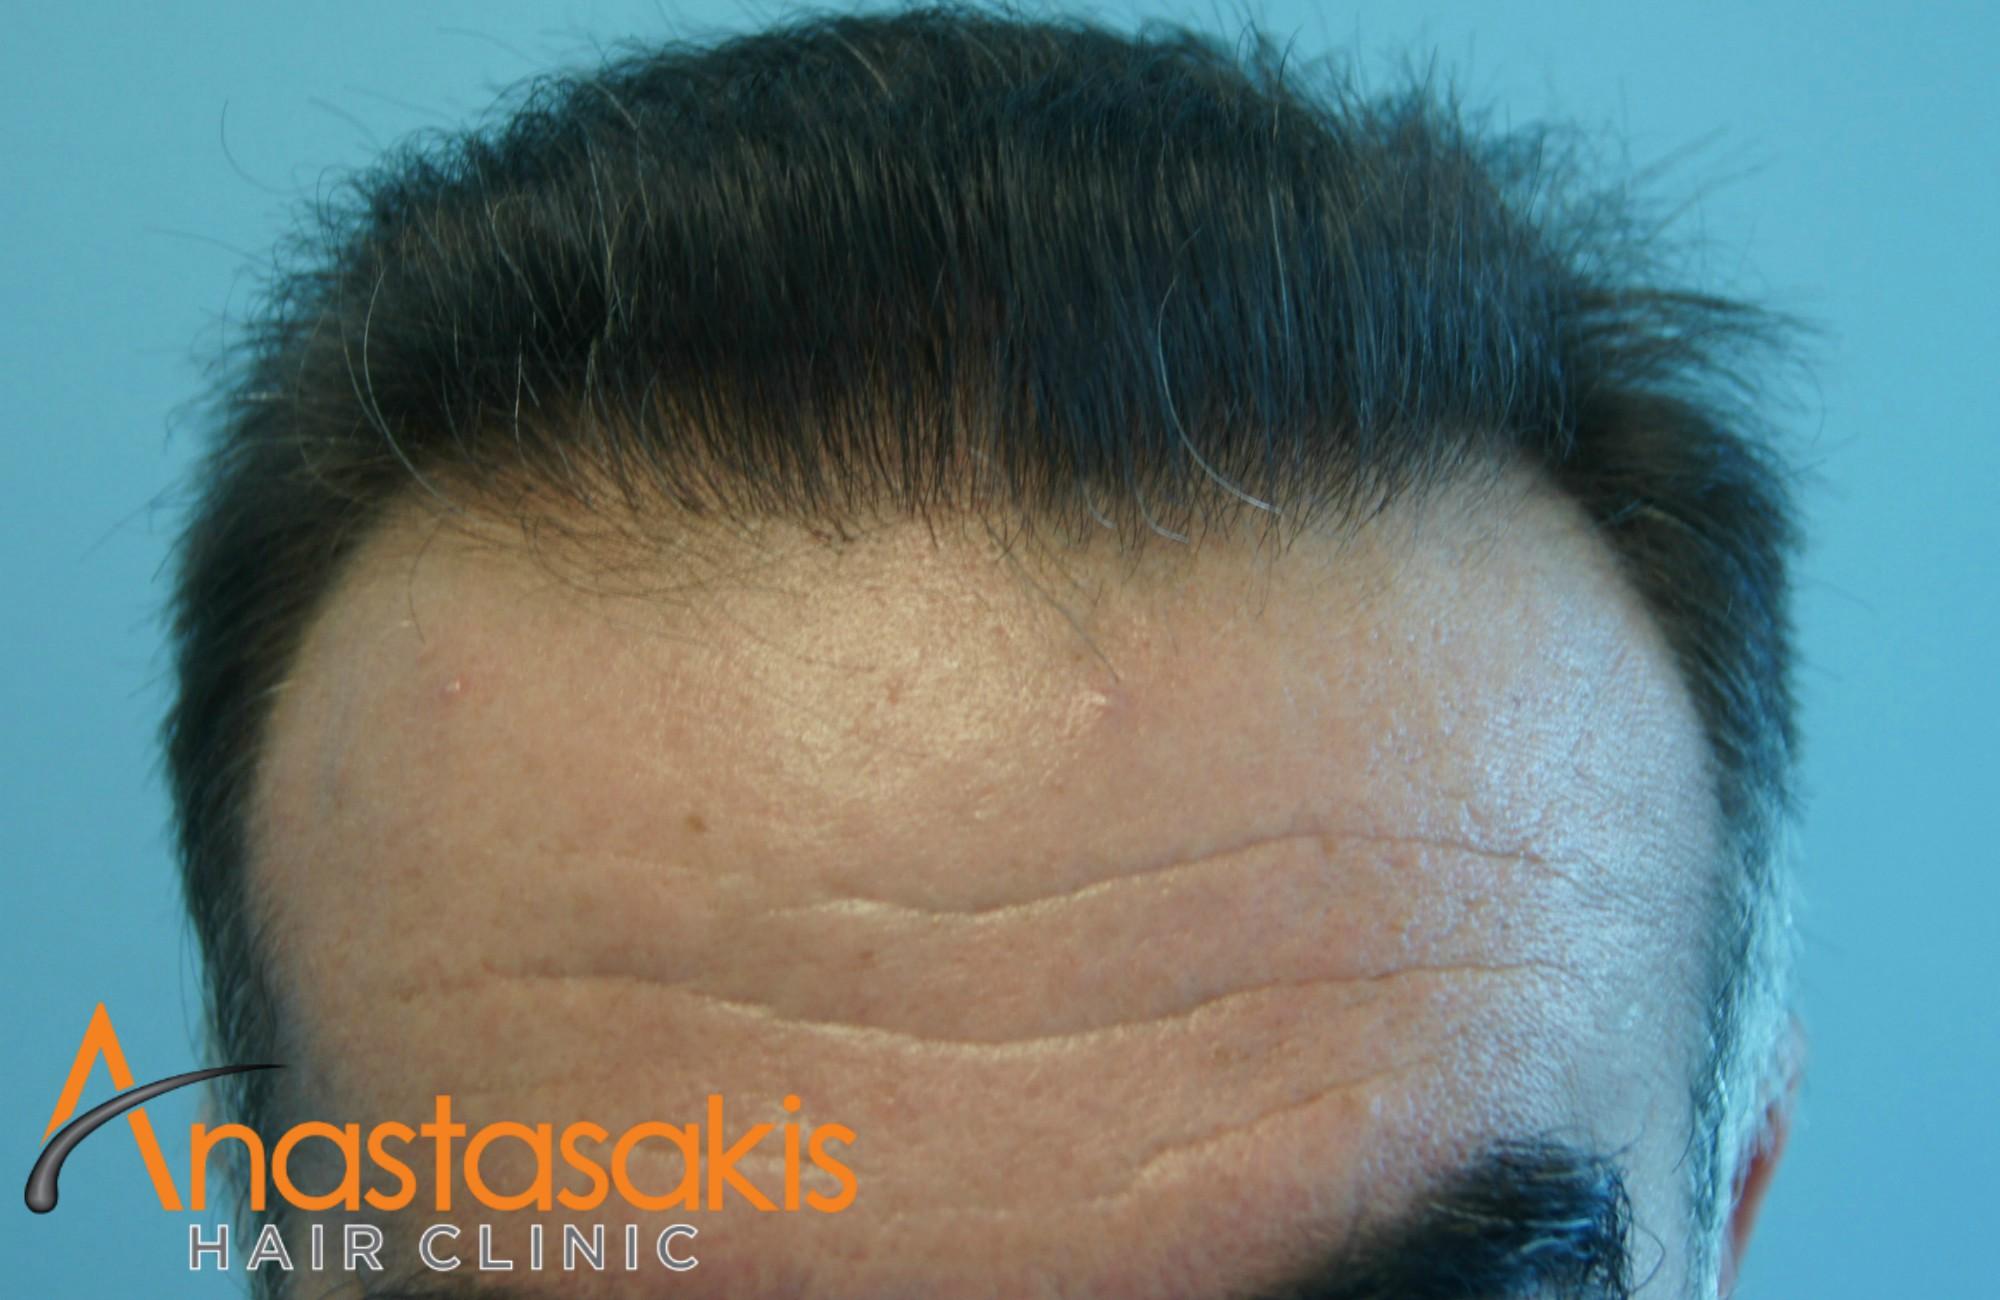 hairline ασθενη μετά την επέμβαση μαλλιών με 3110 fus